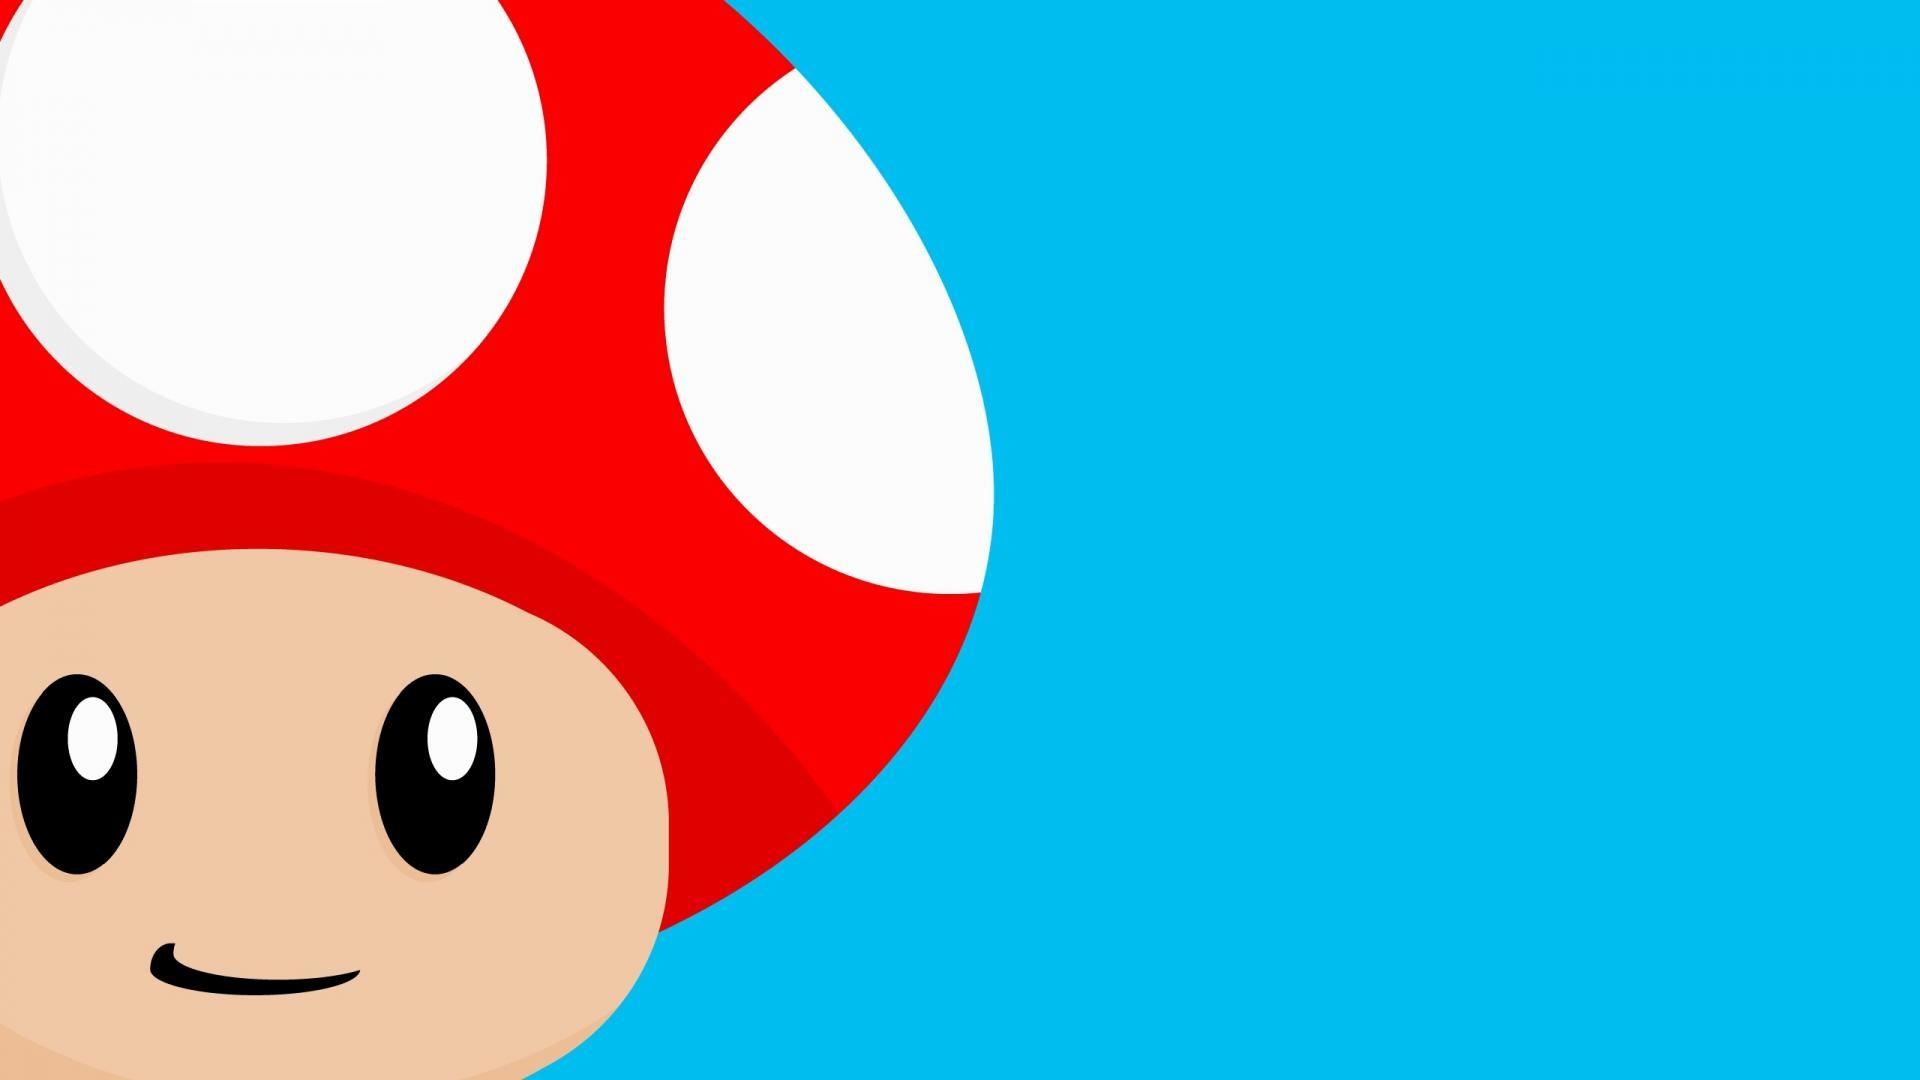 Mario-mushroom-vector-wallpapers-HD